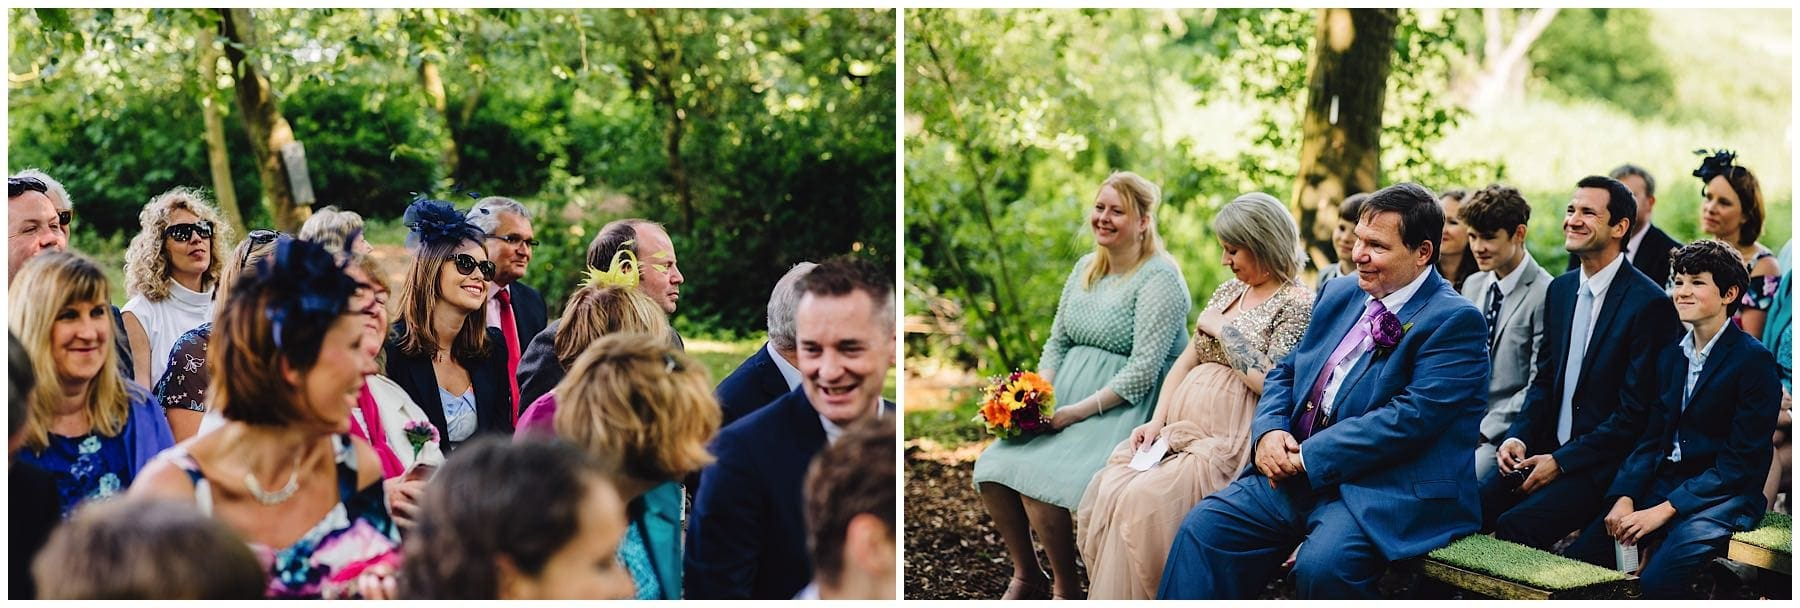 Hothorp Hall Woodlands Wedding Photographer21